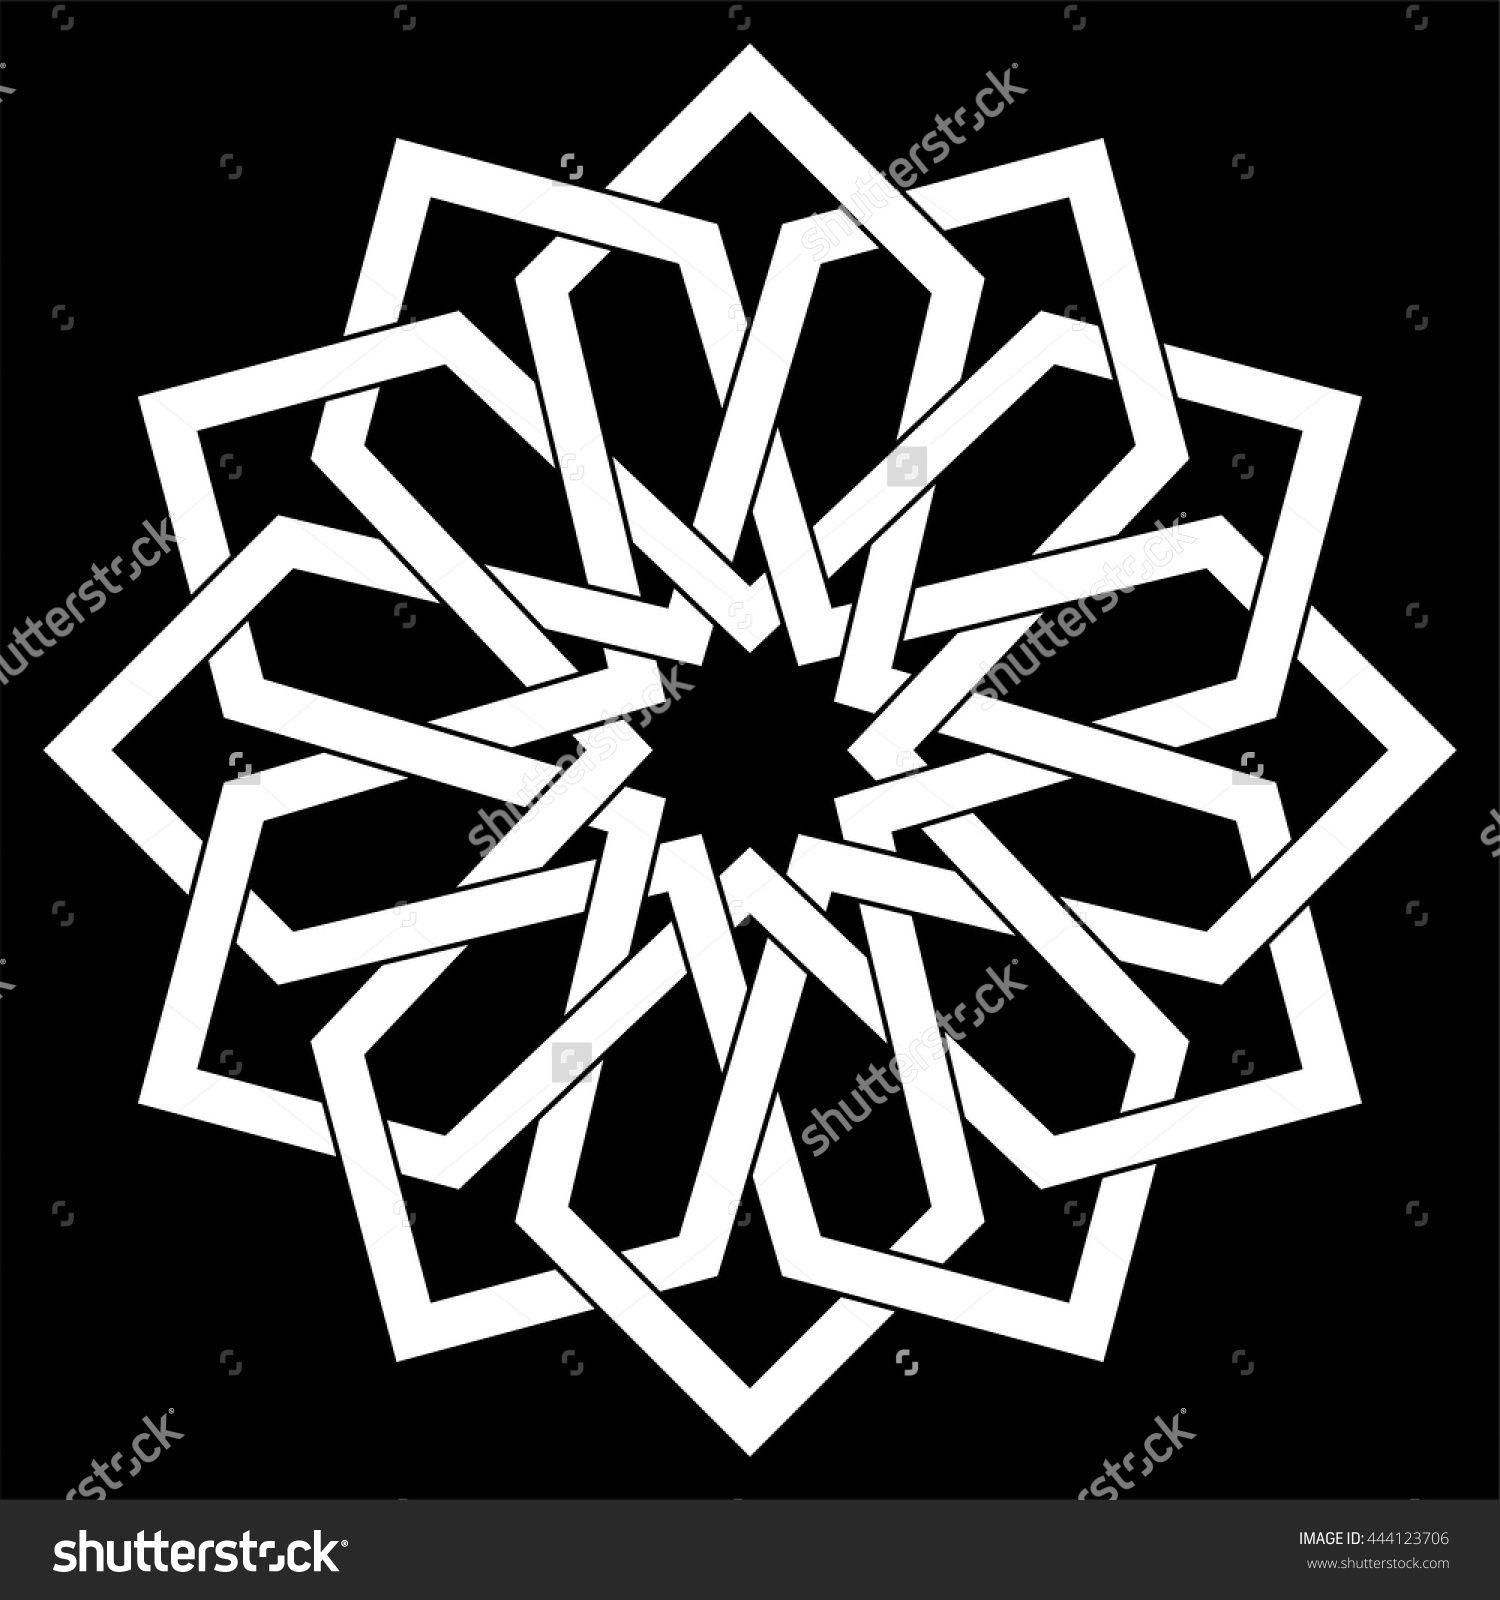 Islamic Geometric Art Arabic Motif Sacred Geometry Star Mandala Vector Illustration Grafik Sanati Stensiller Sanat Desen